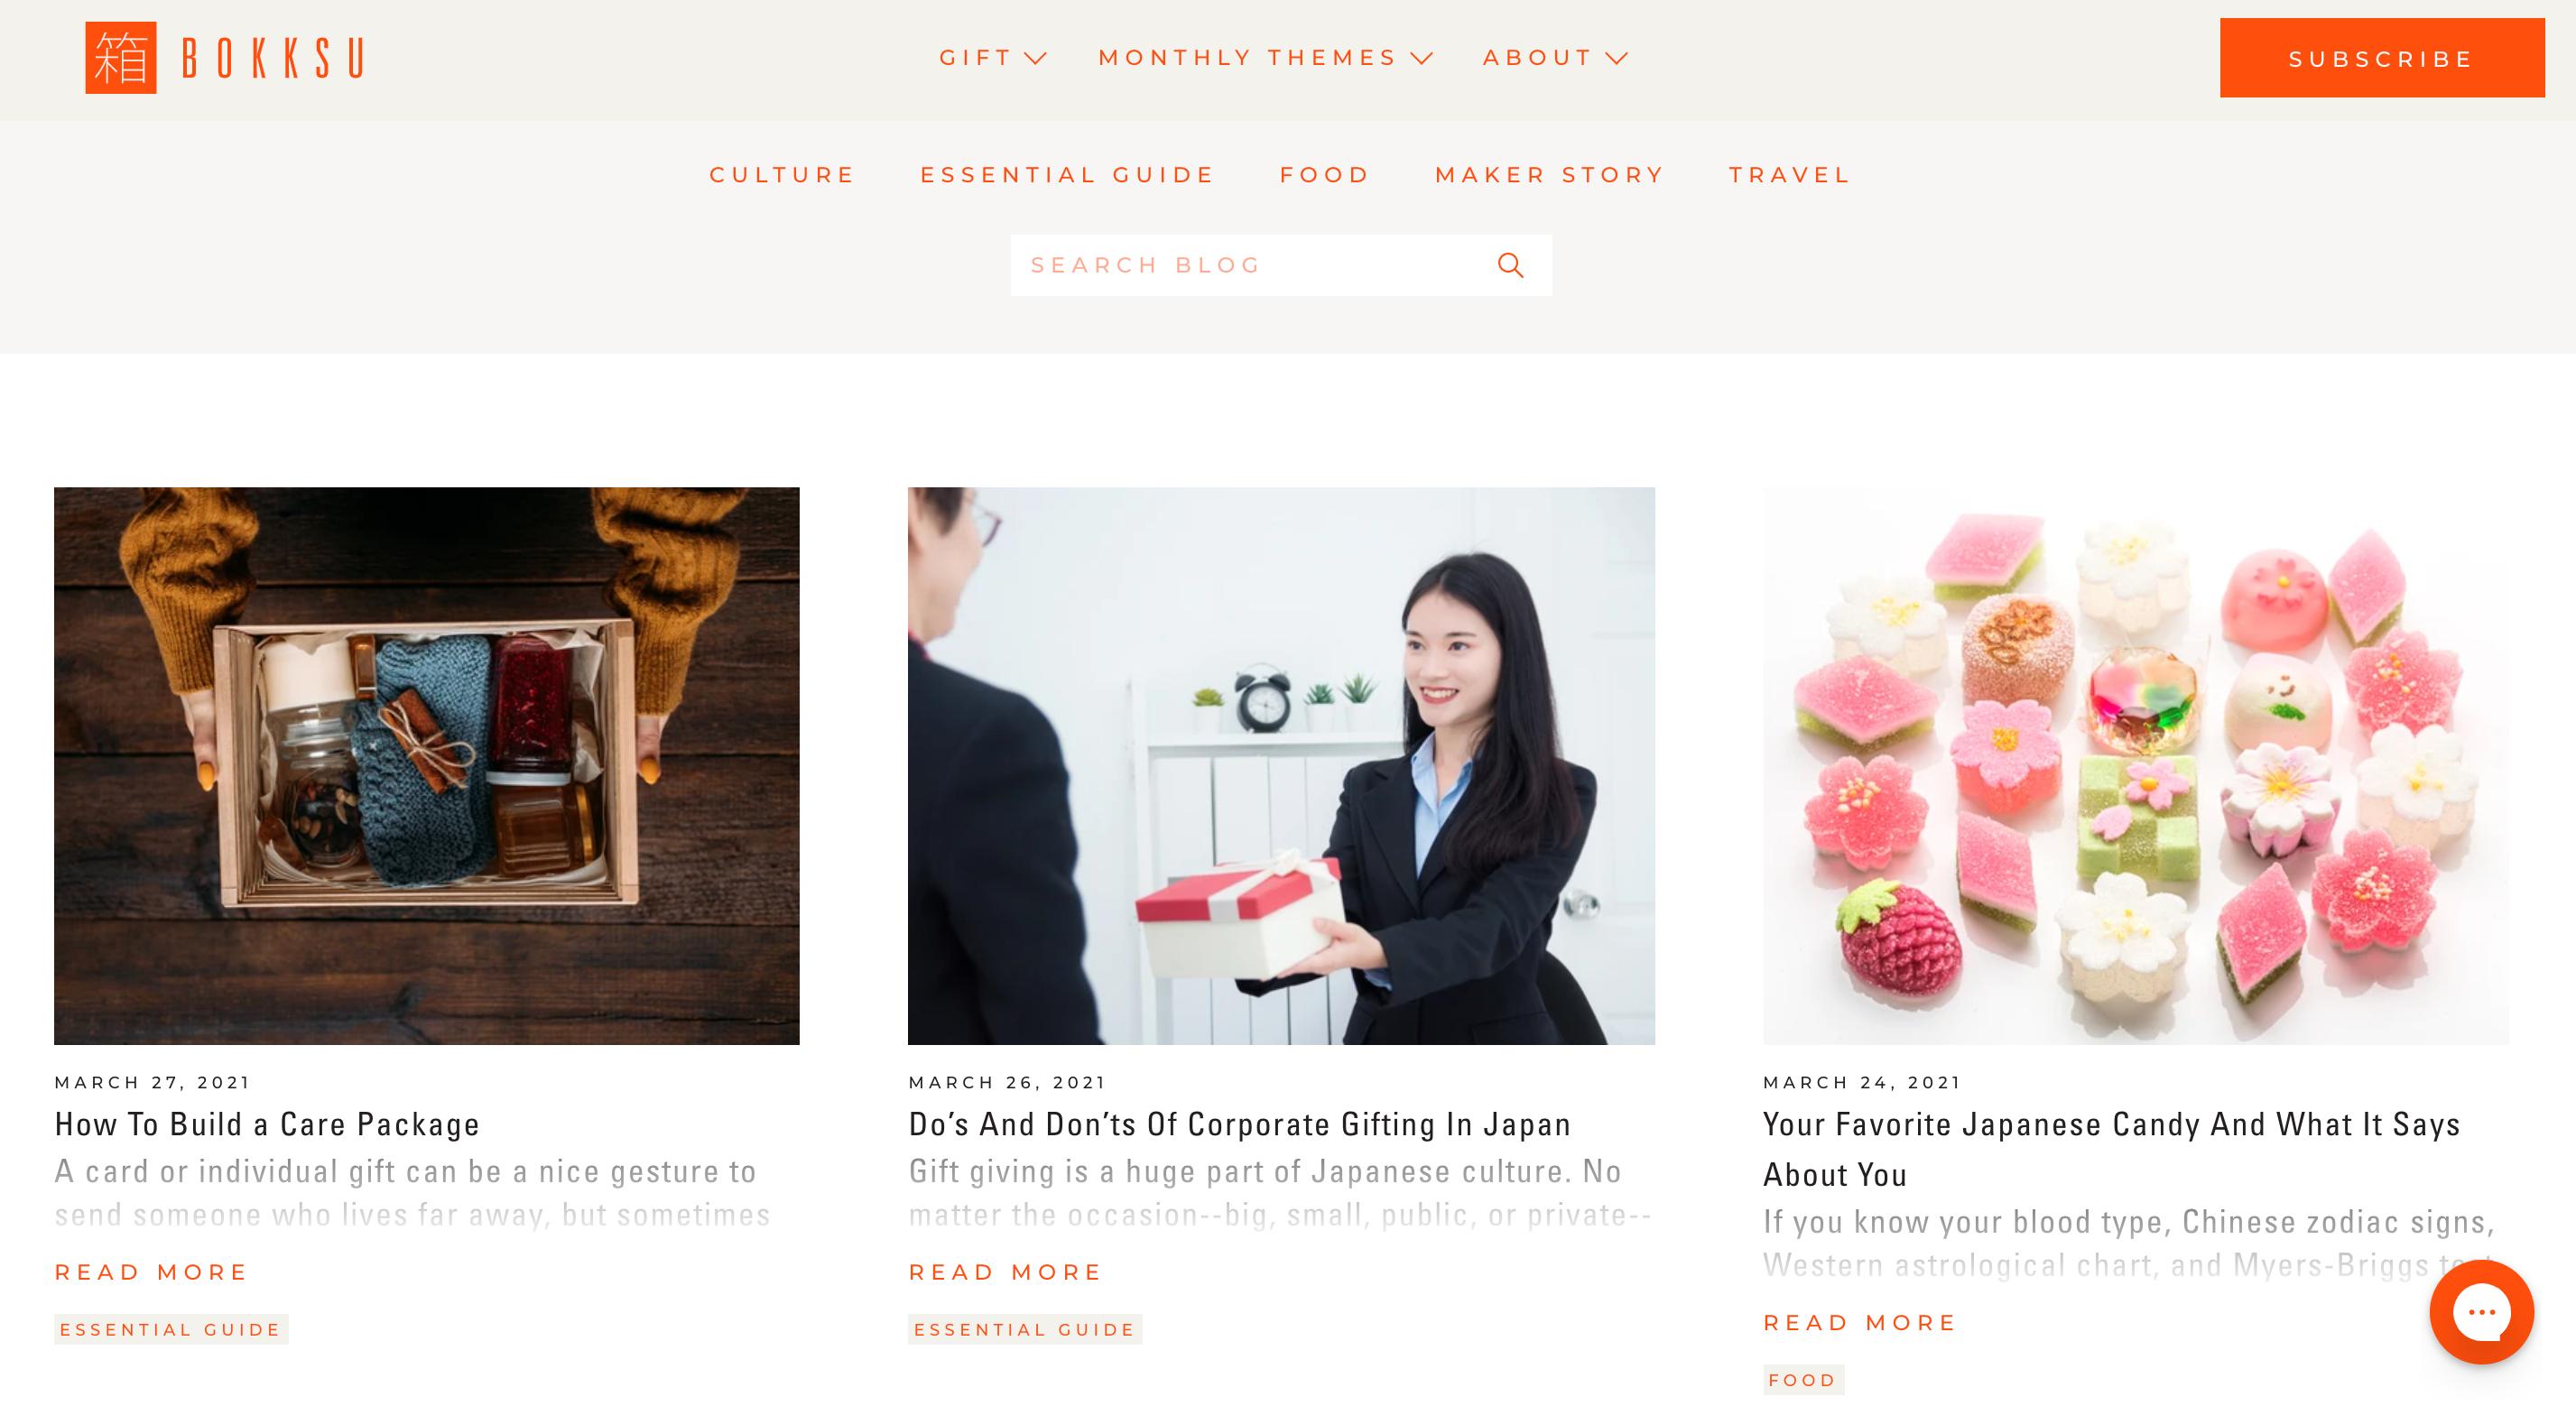 Screenshot of Bokksus website blog page